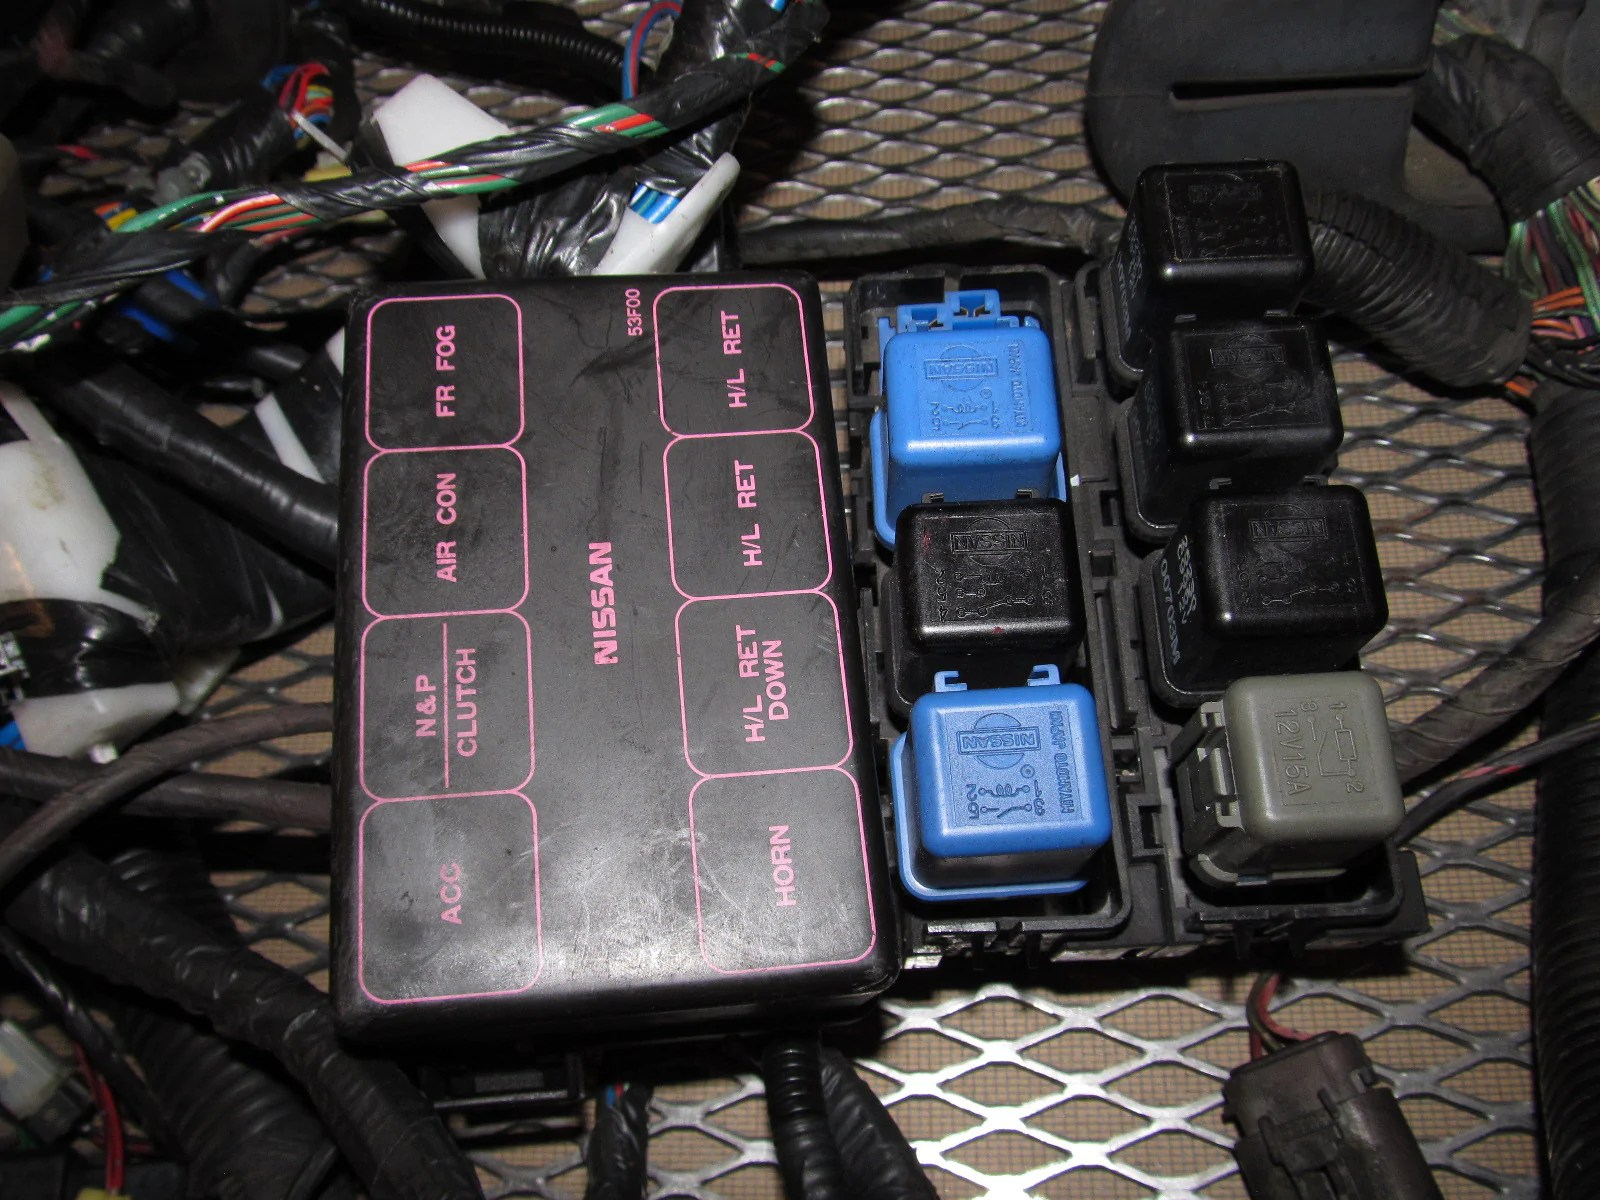 S13 Fuse Box Cover Sr20det Into S14 Wiring Diagram Interior Blogs Plugs 89 240sx